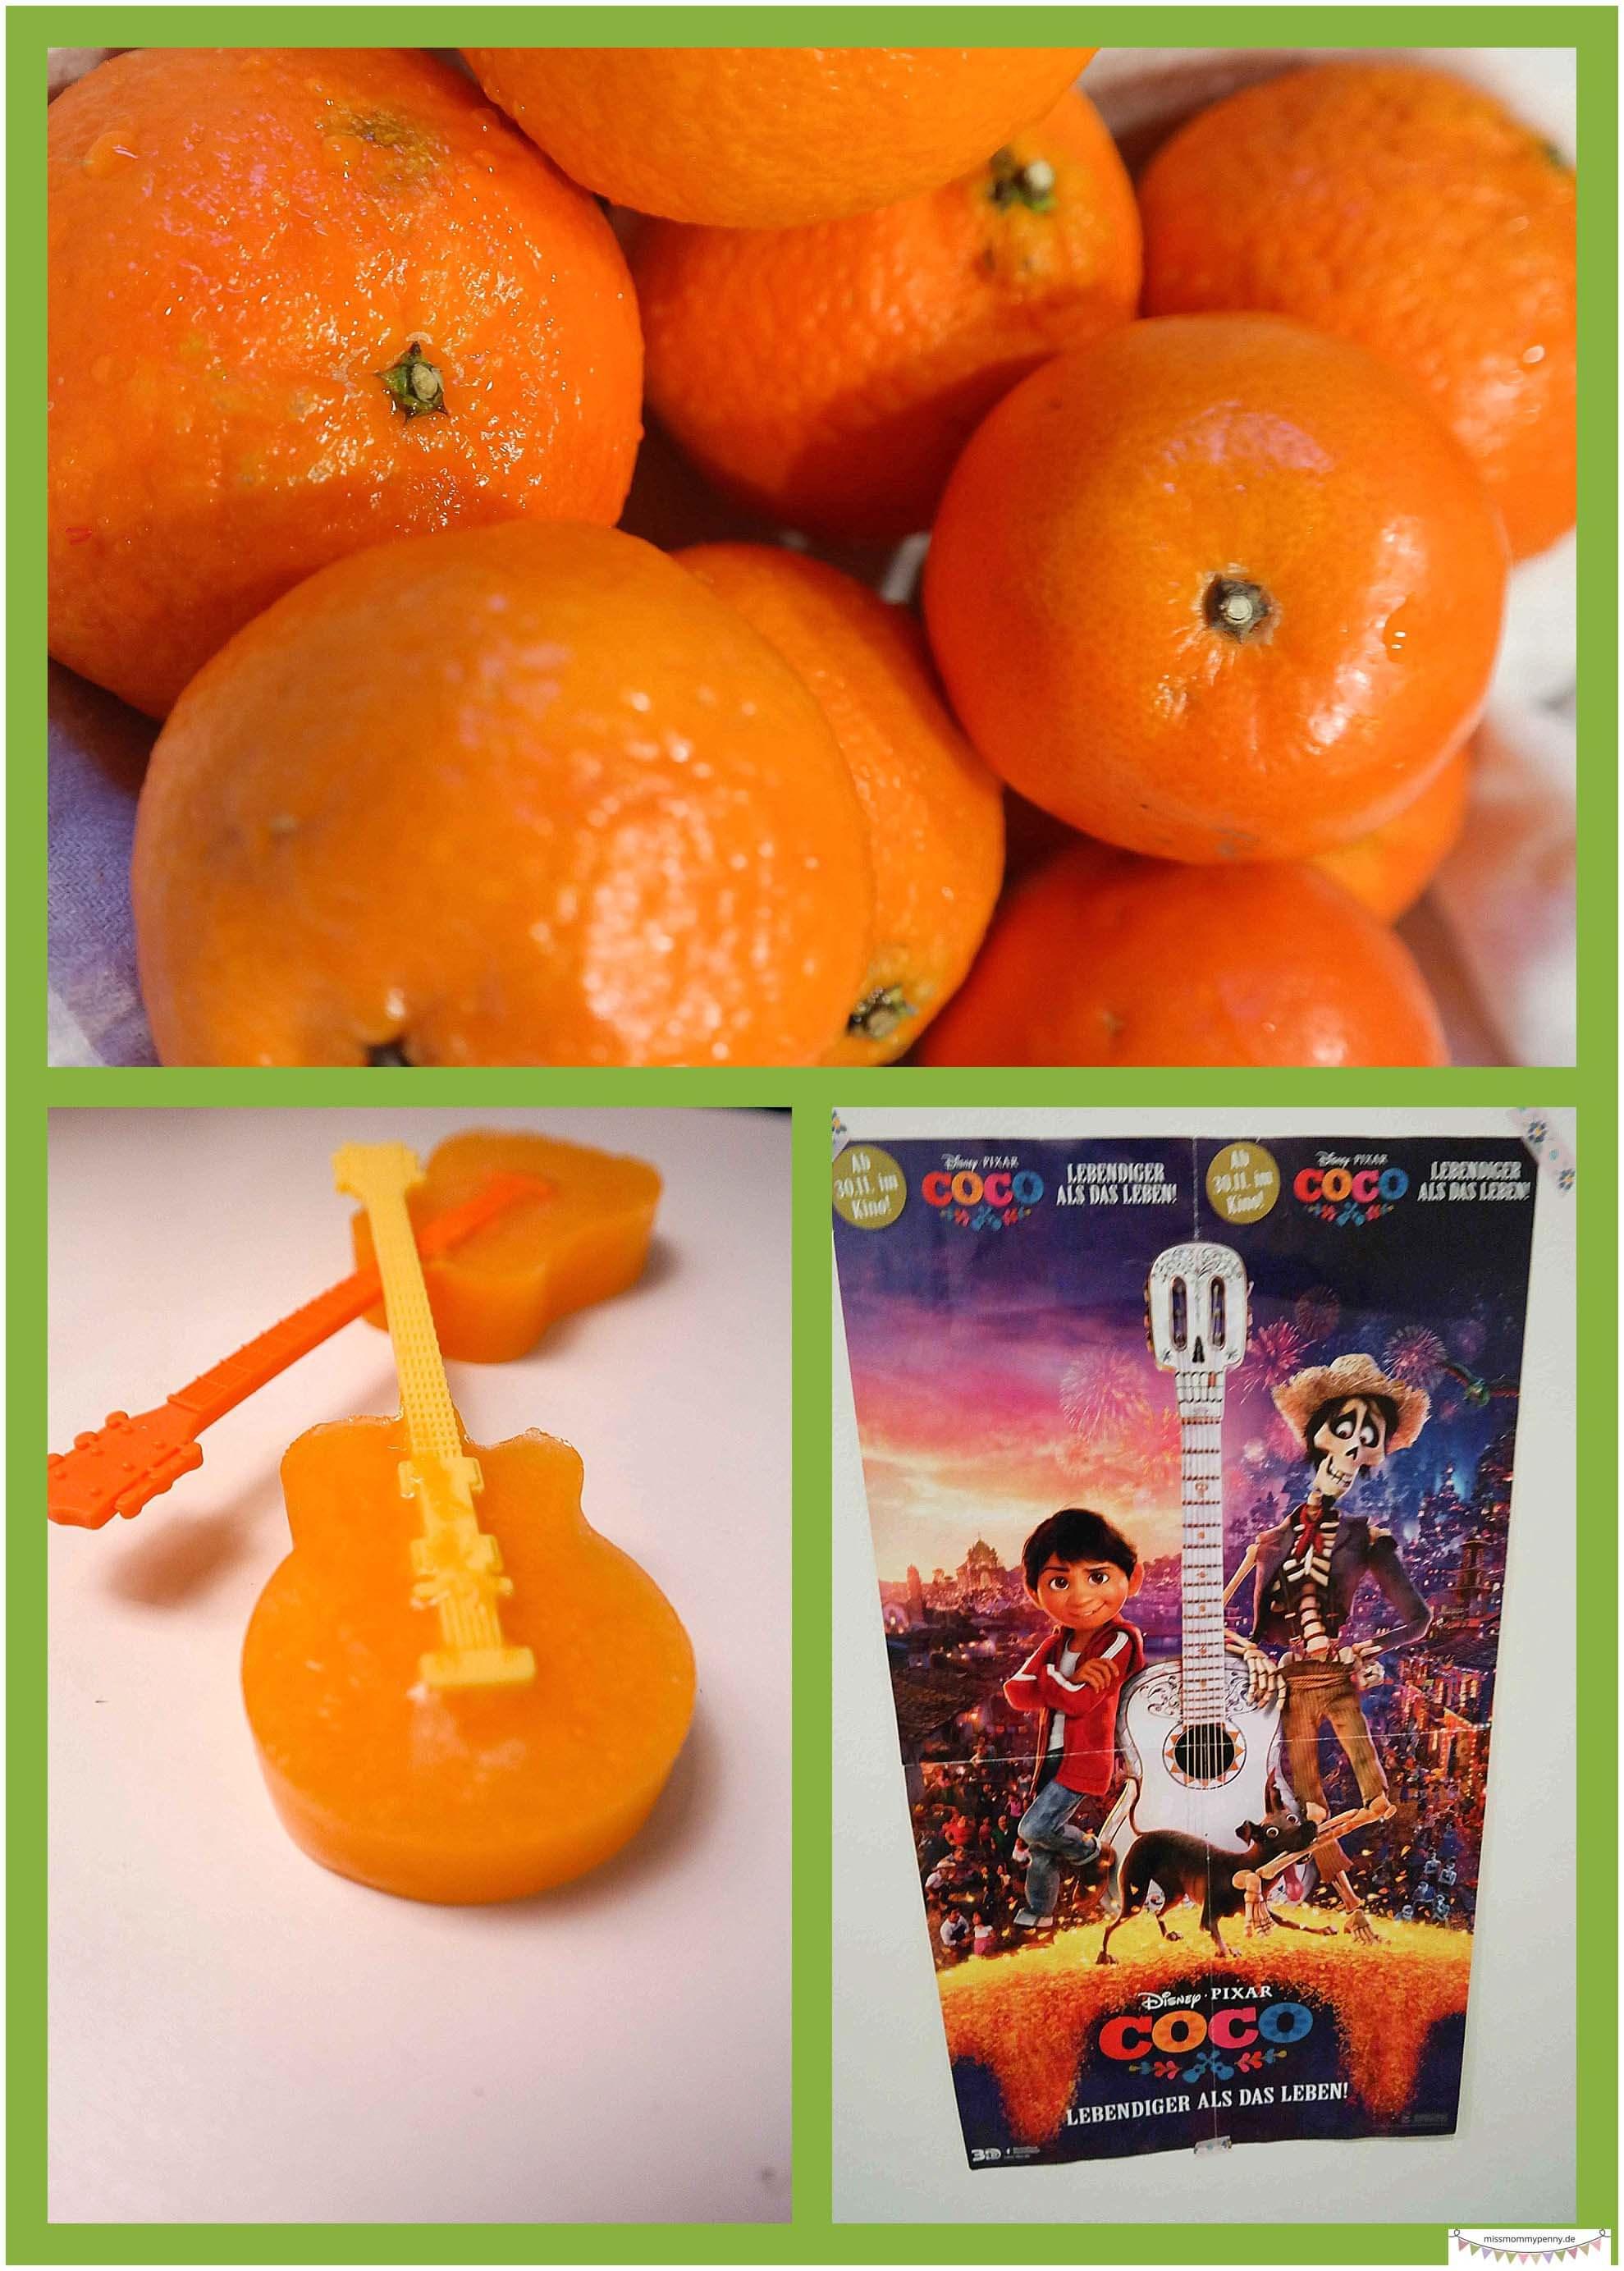 Orangeneis - Speisen in Gitarrenform